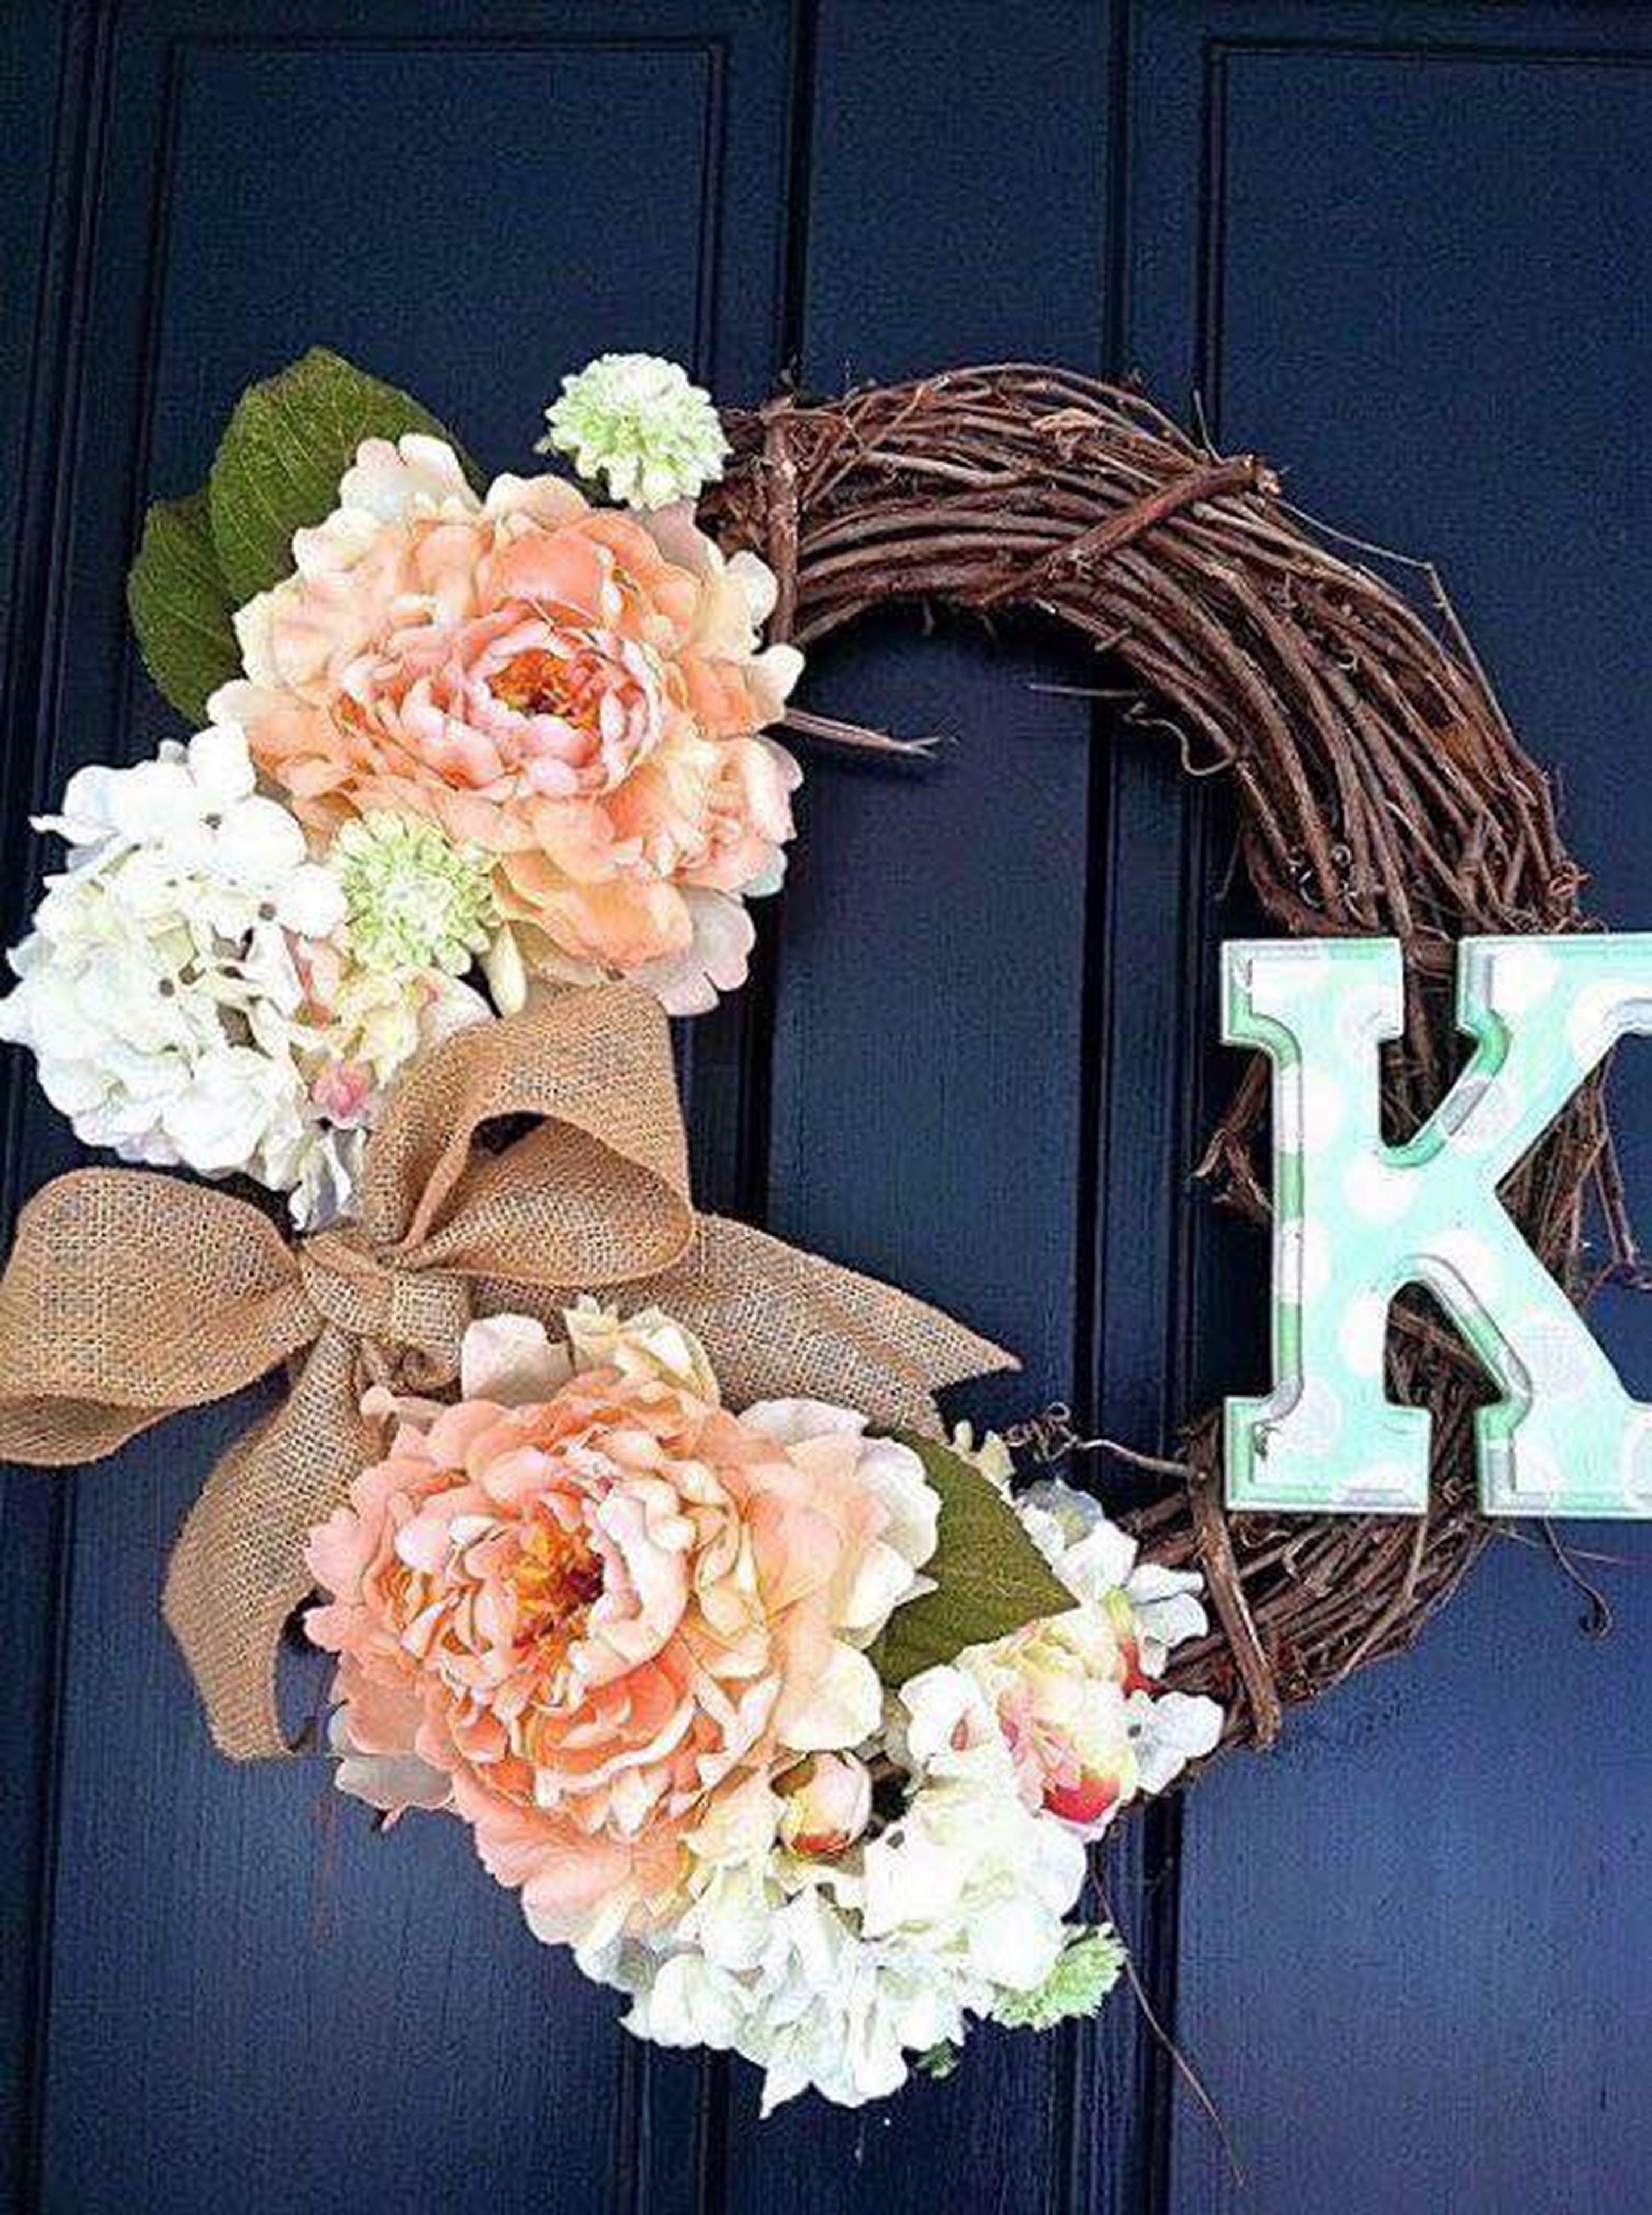 flower, bouquet, freshness, wedding, bride, life events, indoors, wedding dress, day, people